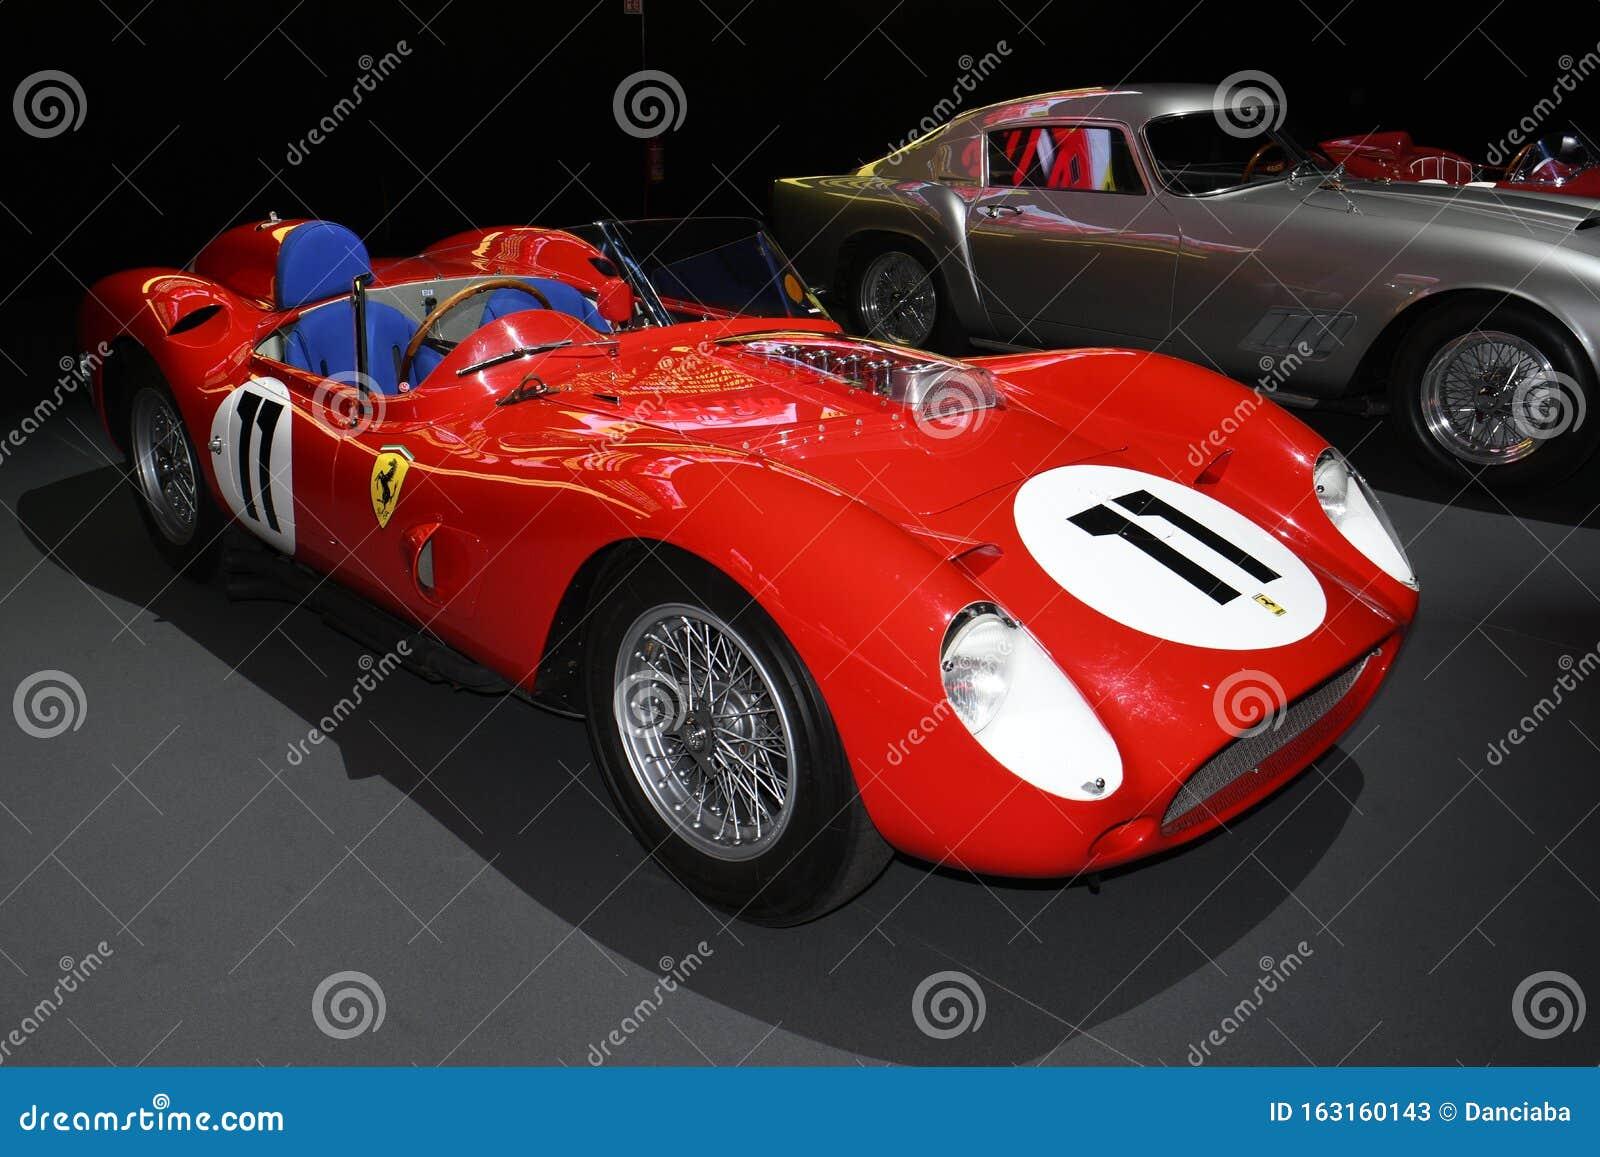 Mugello Circuit 25 October 2019 Vintage Ferrari 250 Tr Year 1960 On Display During Finali Mondiali Ferrari 2019 At Mugello Circu Editorial Stock Photo Image Of Background Automobile 163160143